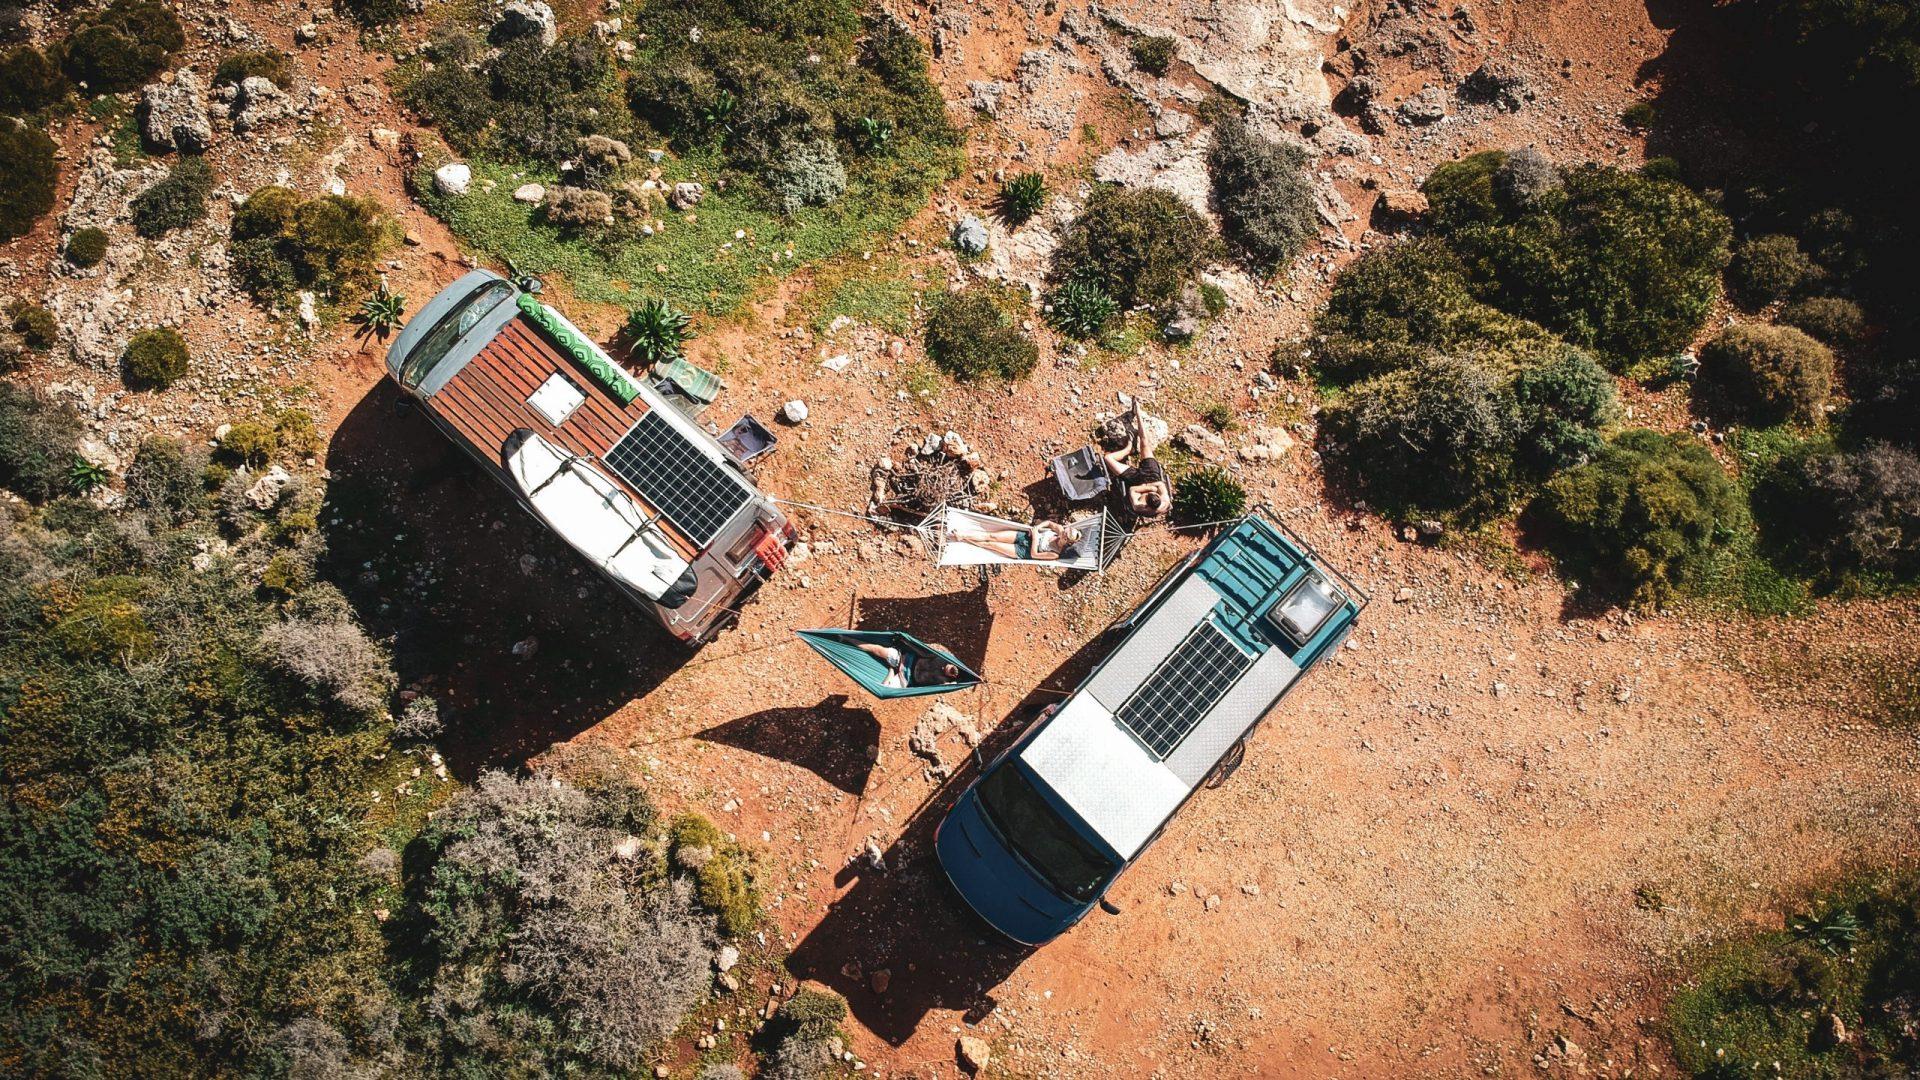 Reisverslag Europa week 26 | Bussen en hangmatten bovenaf